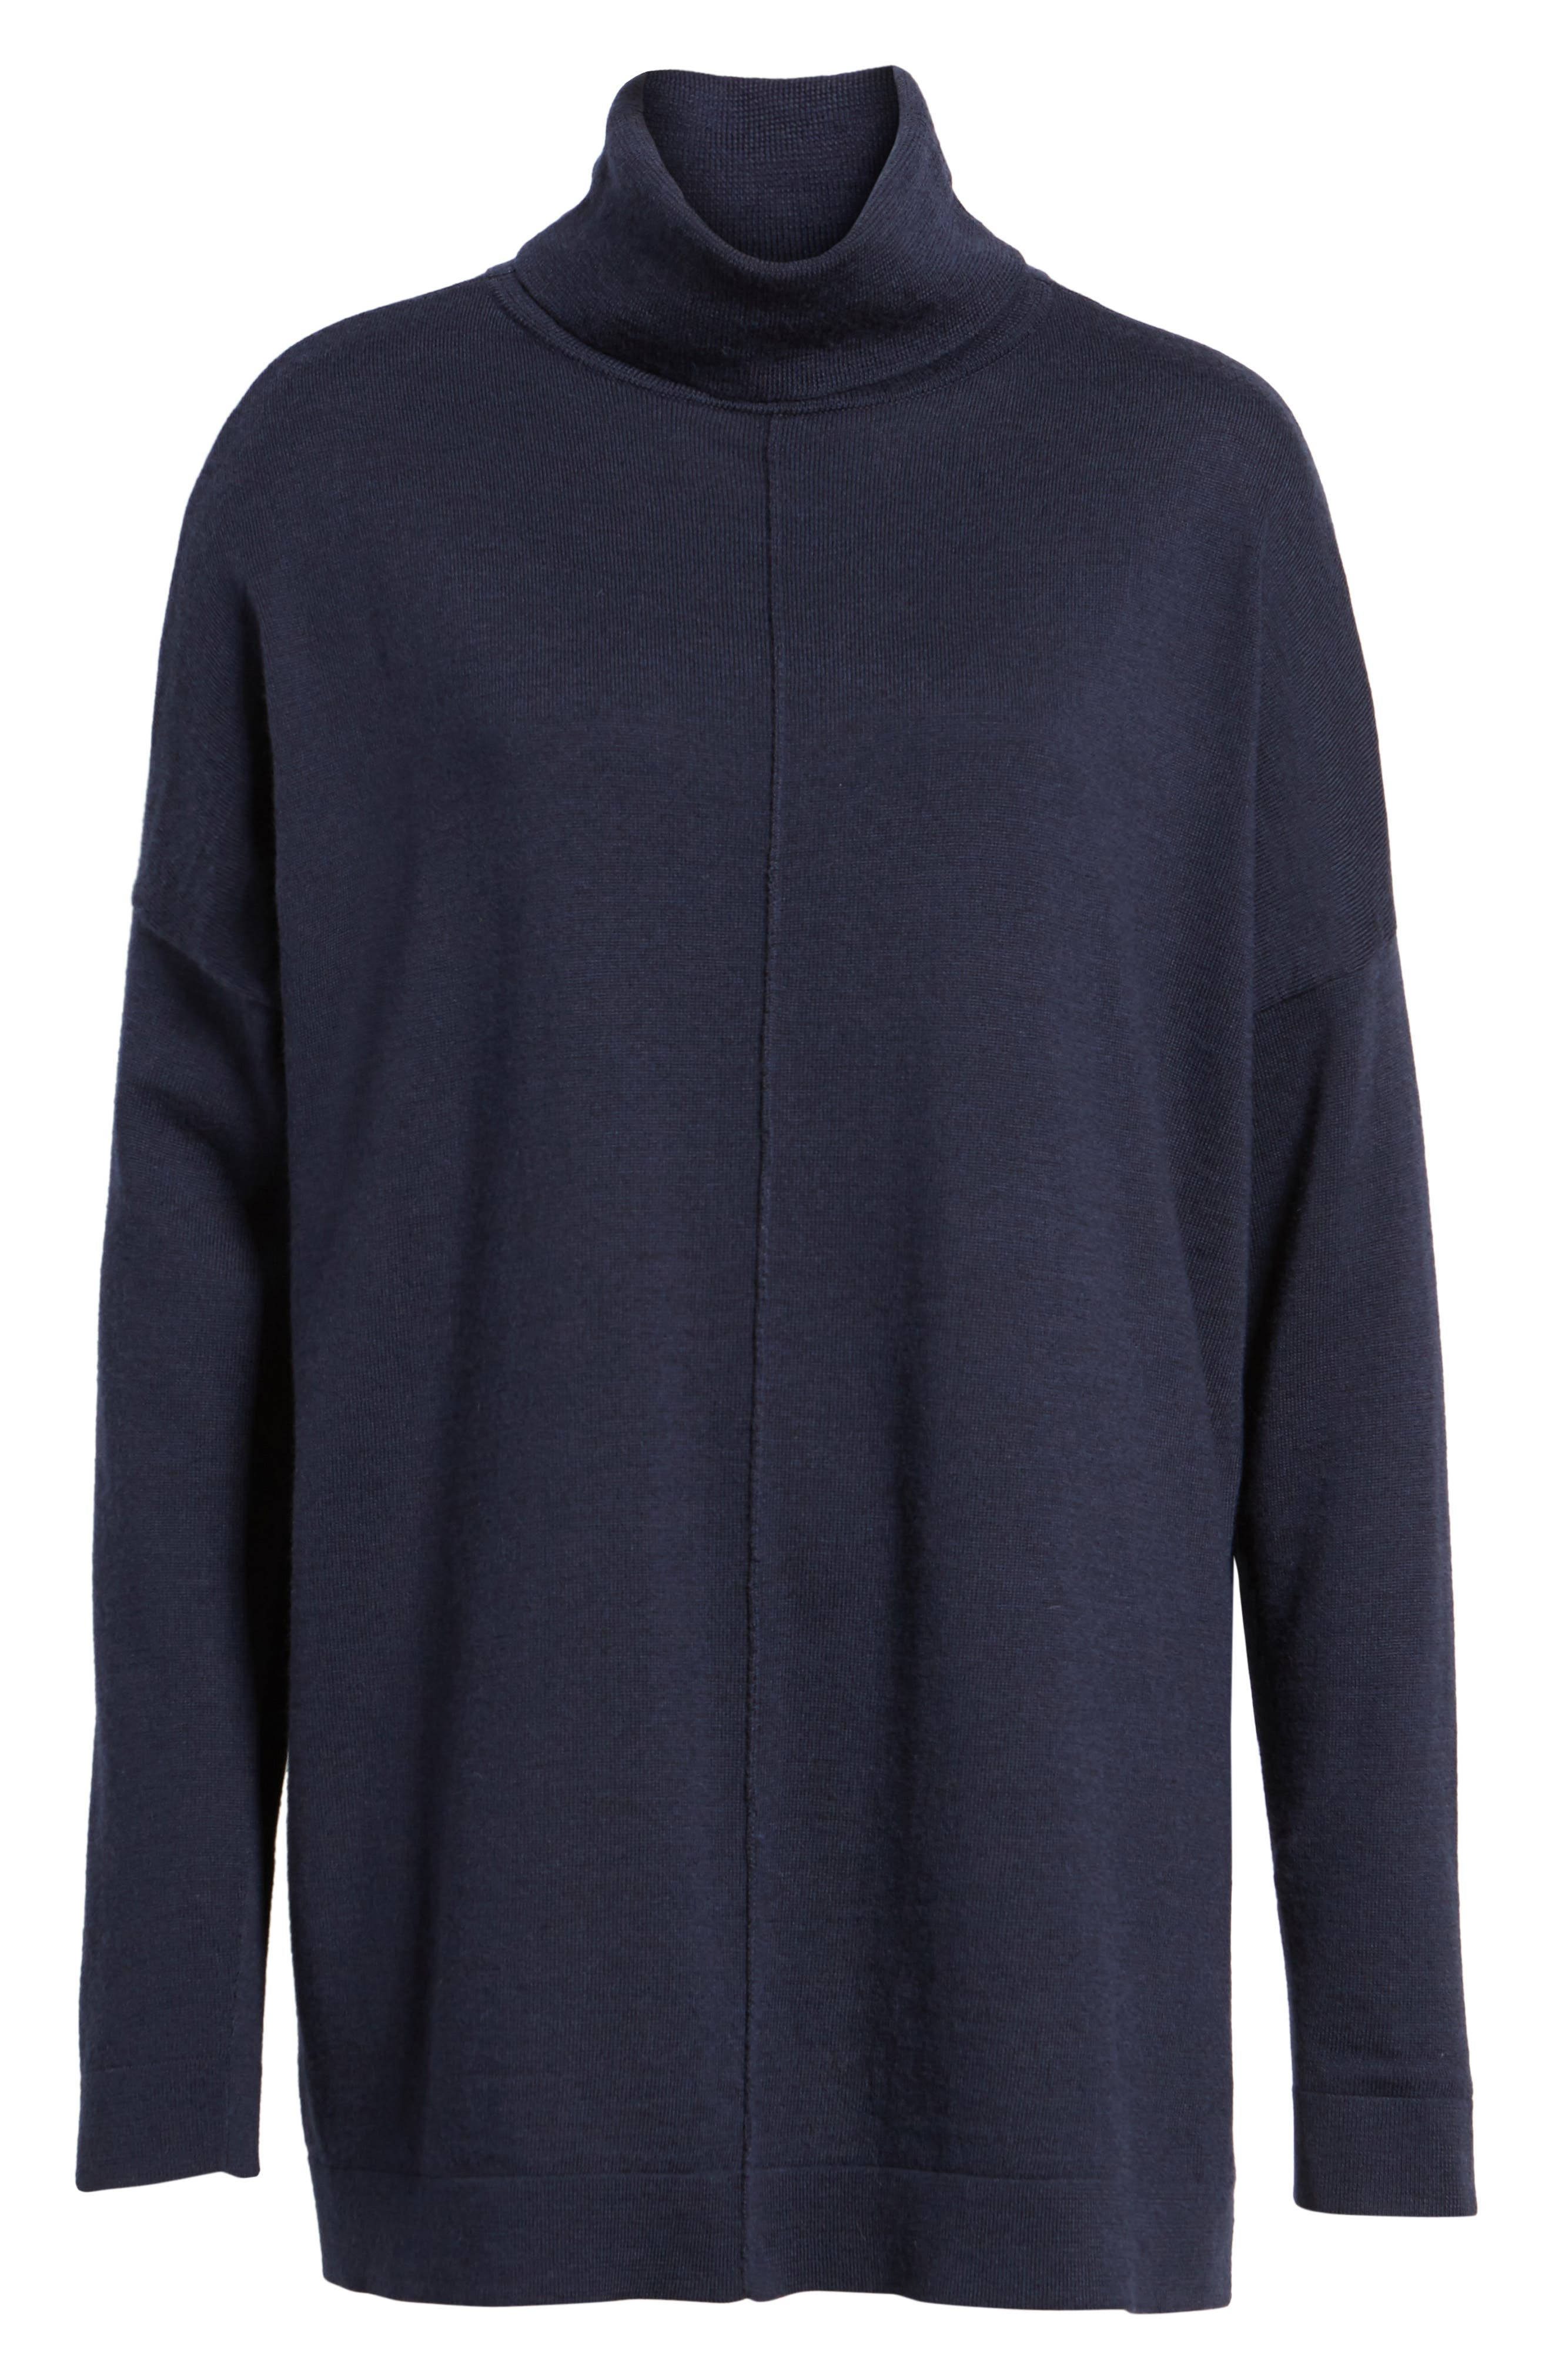 Merino Wool Boxy Turtleneck Sweater,                             Alternate thumbnail 33, color,